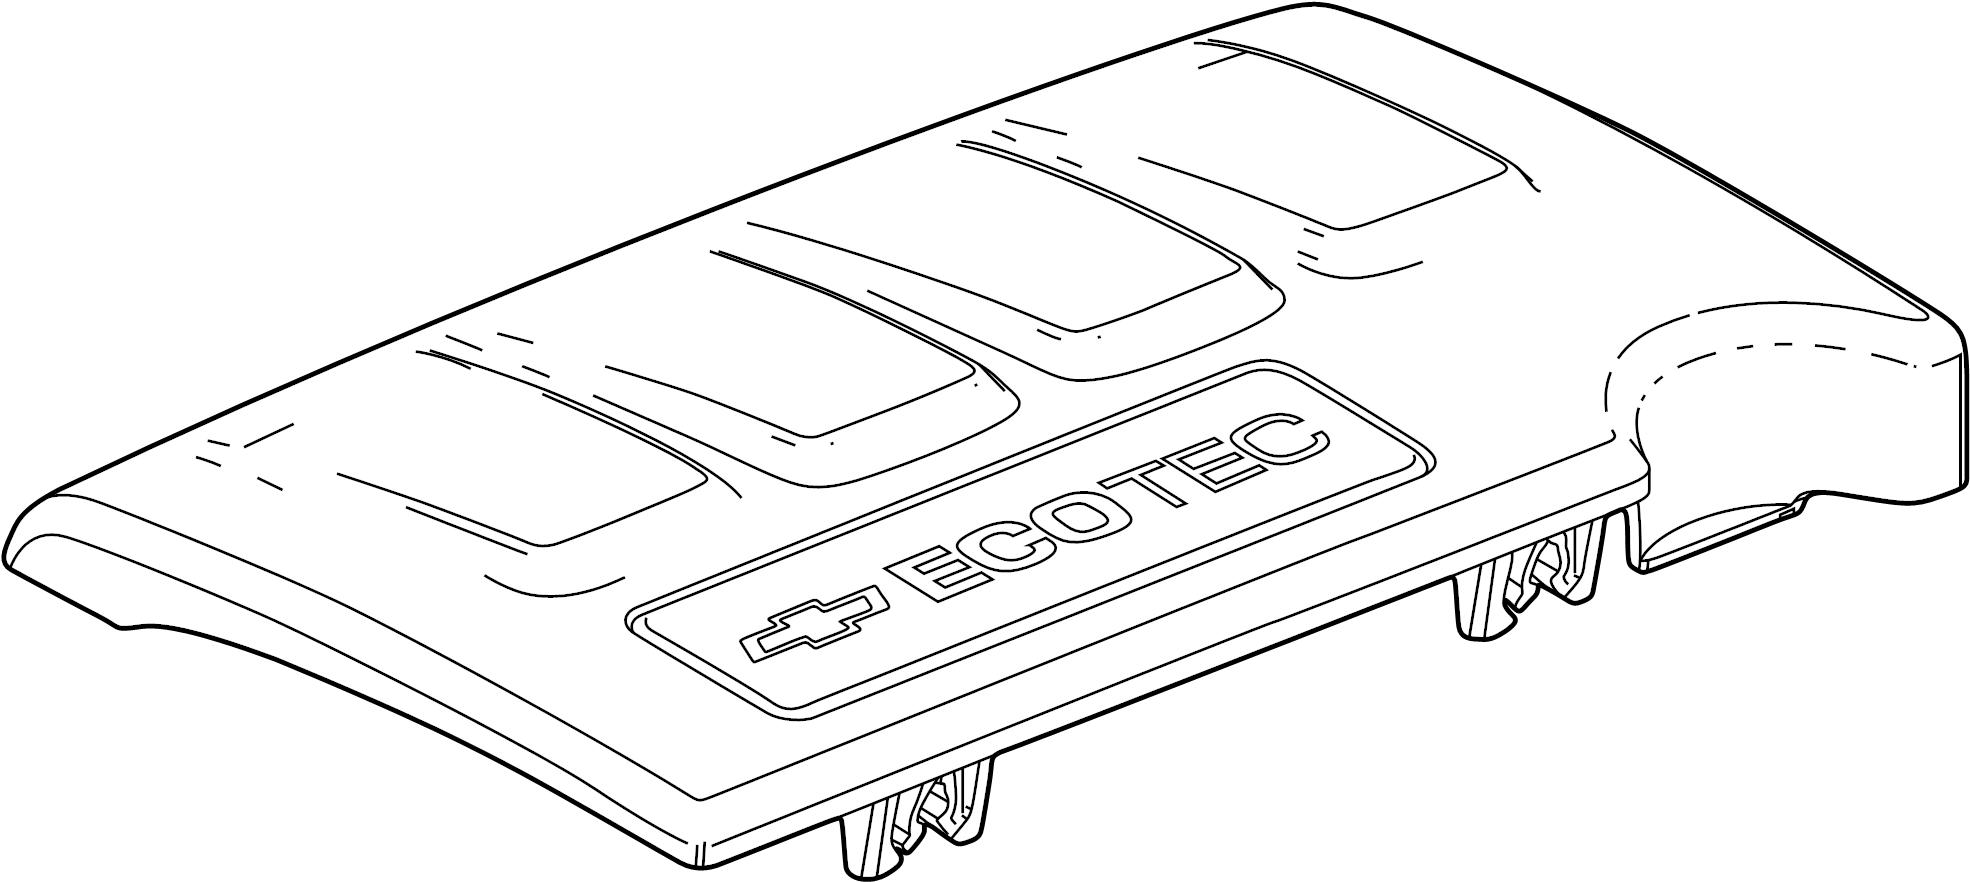 Chevrolet Cruze Emblem. Engine cover. 1.4 liter turbo